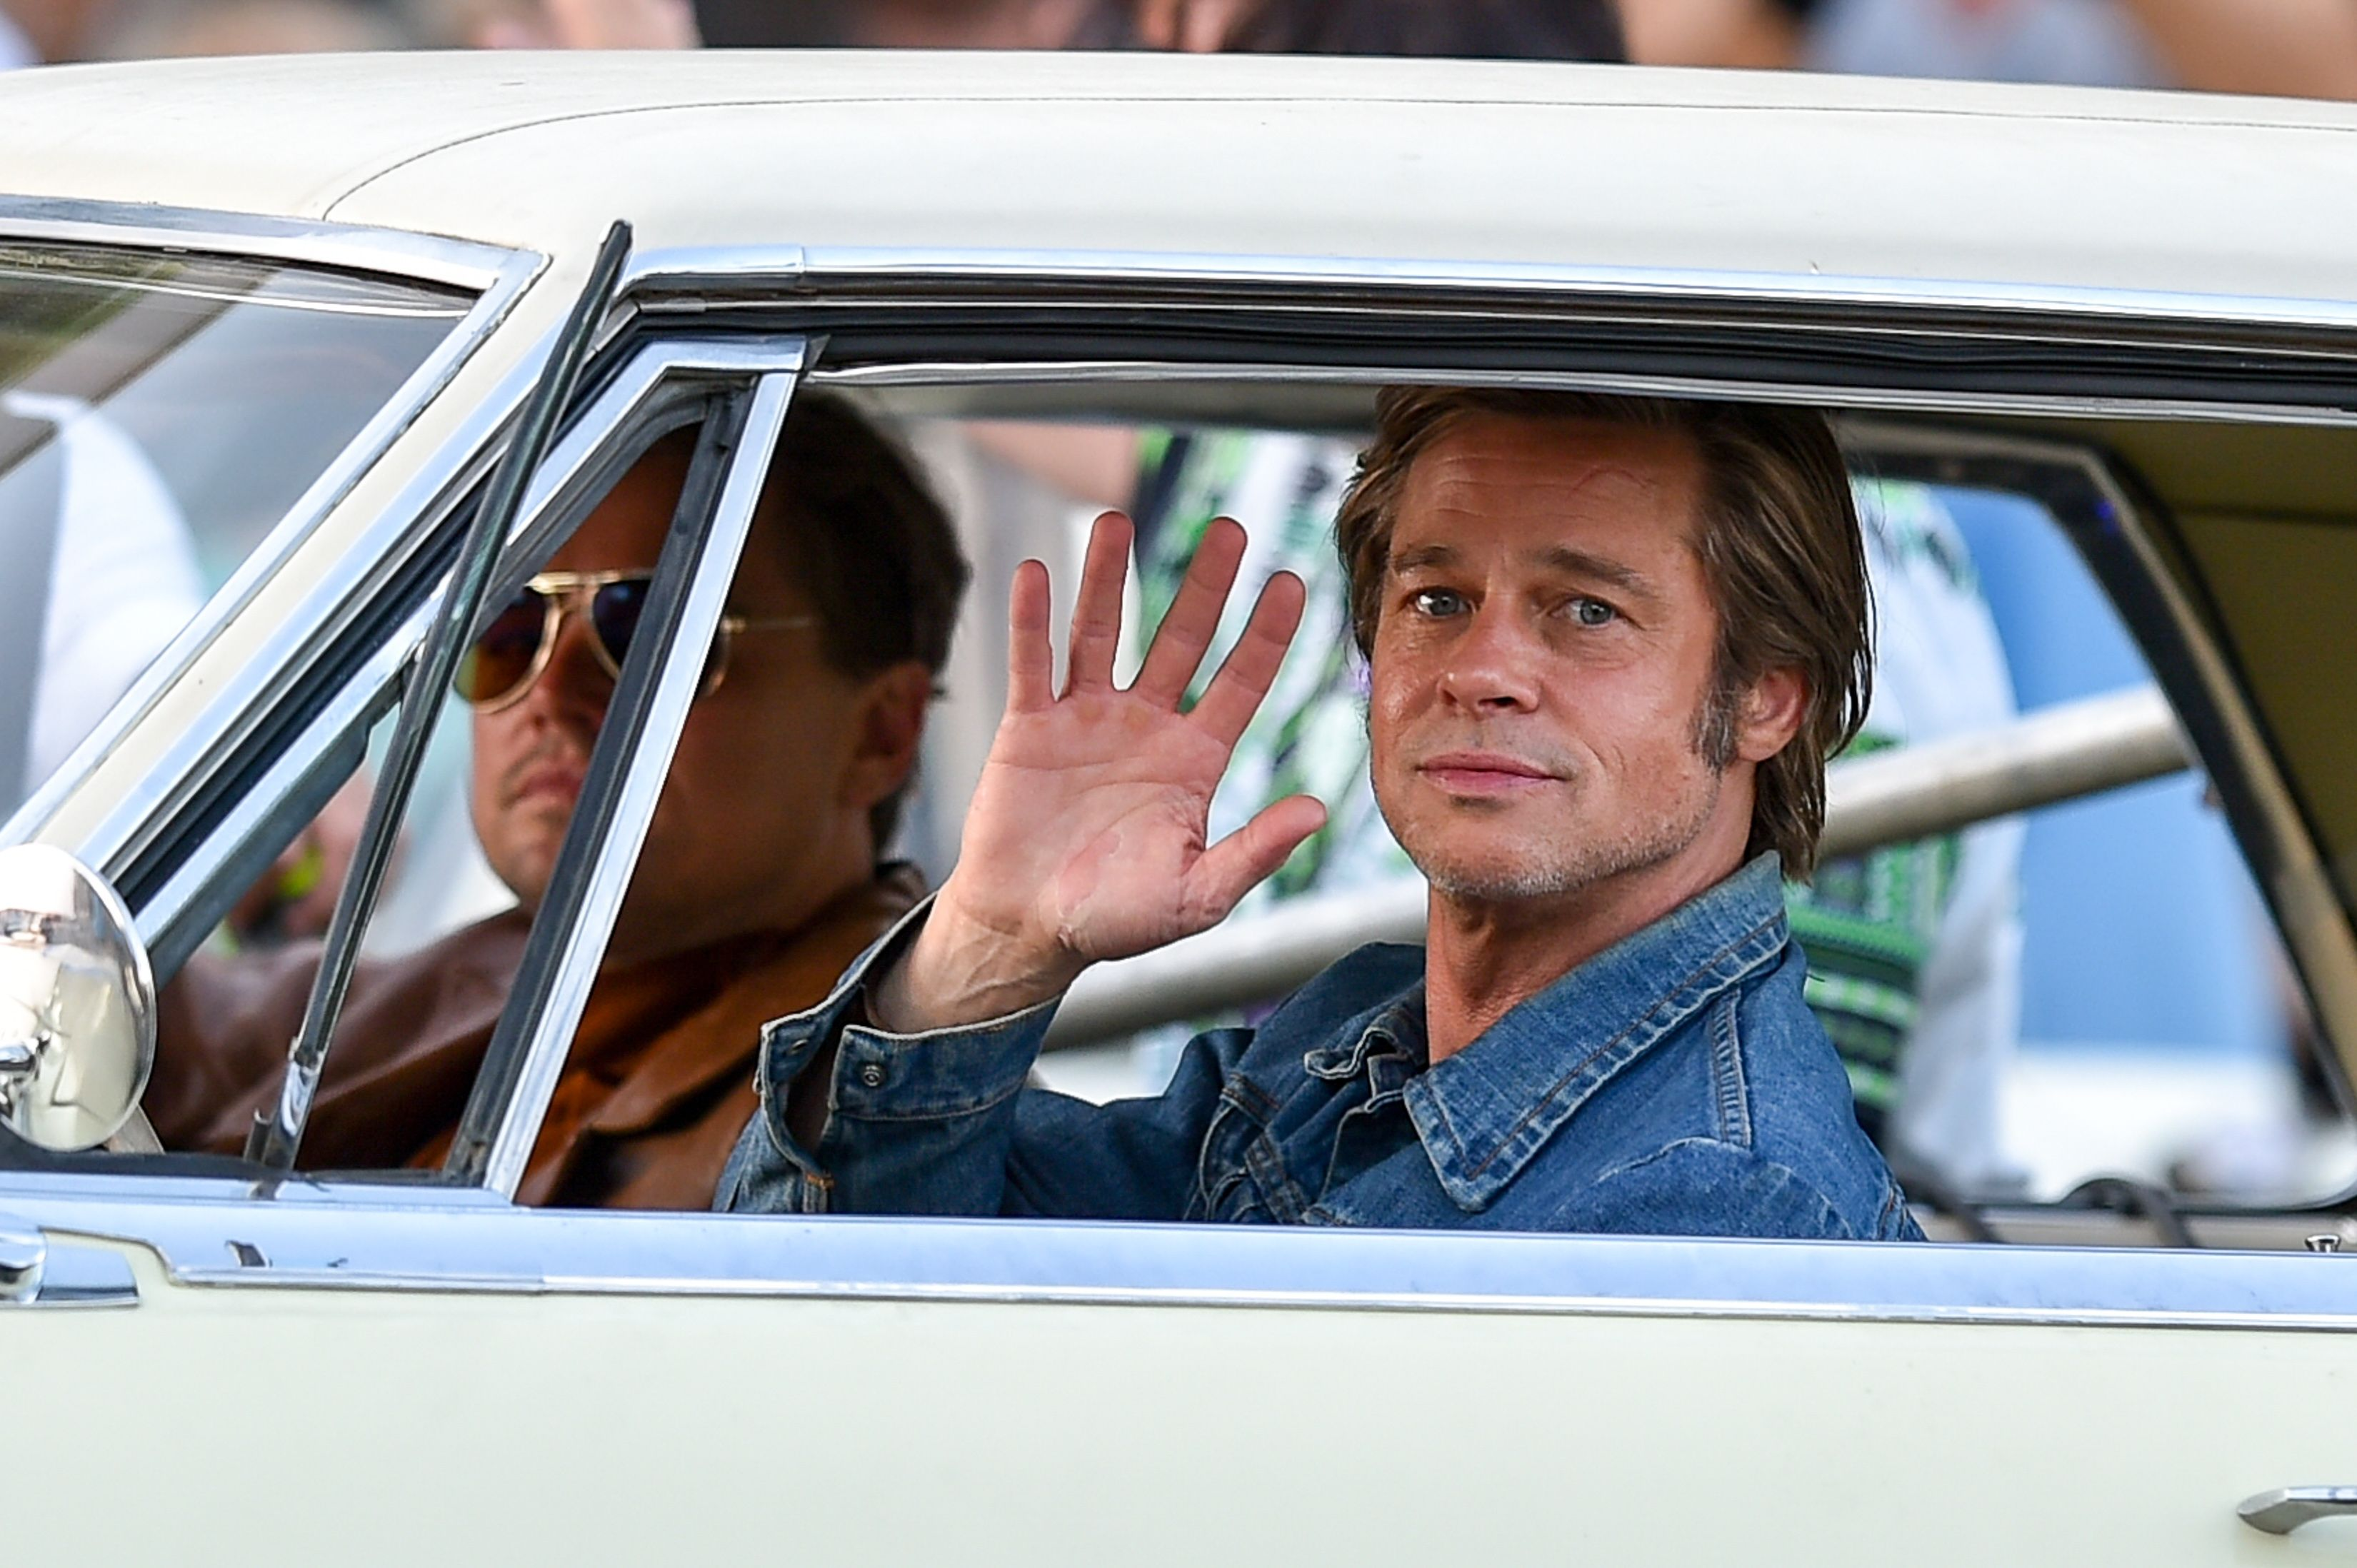 Brad Pitt's Hot New Role Is a Hitman Named Ladybug